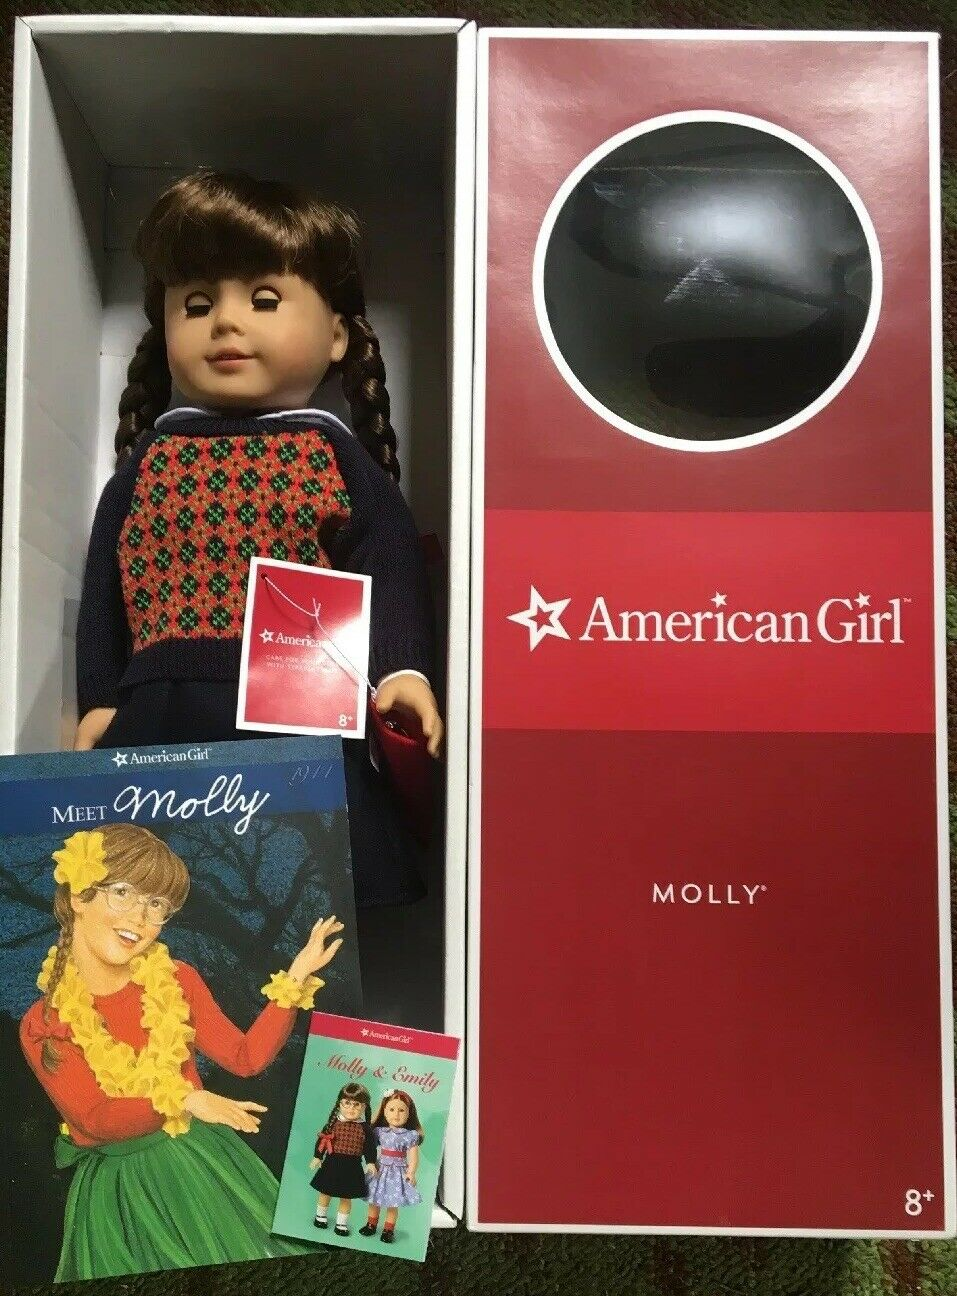 "RETIrot-18"" American Girl Doll MOLLY McINTIRE W Accessories 2008 in Box"